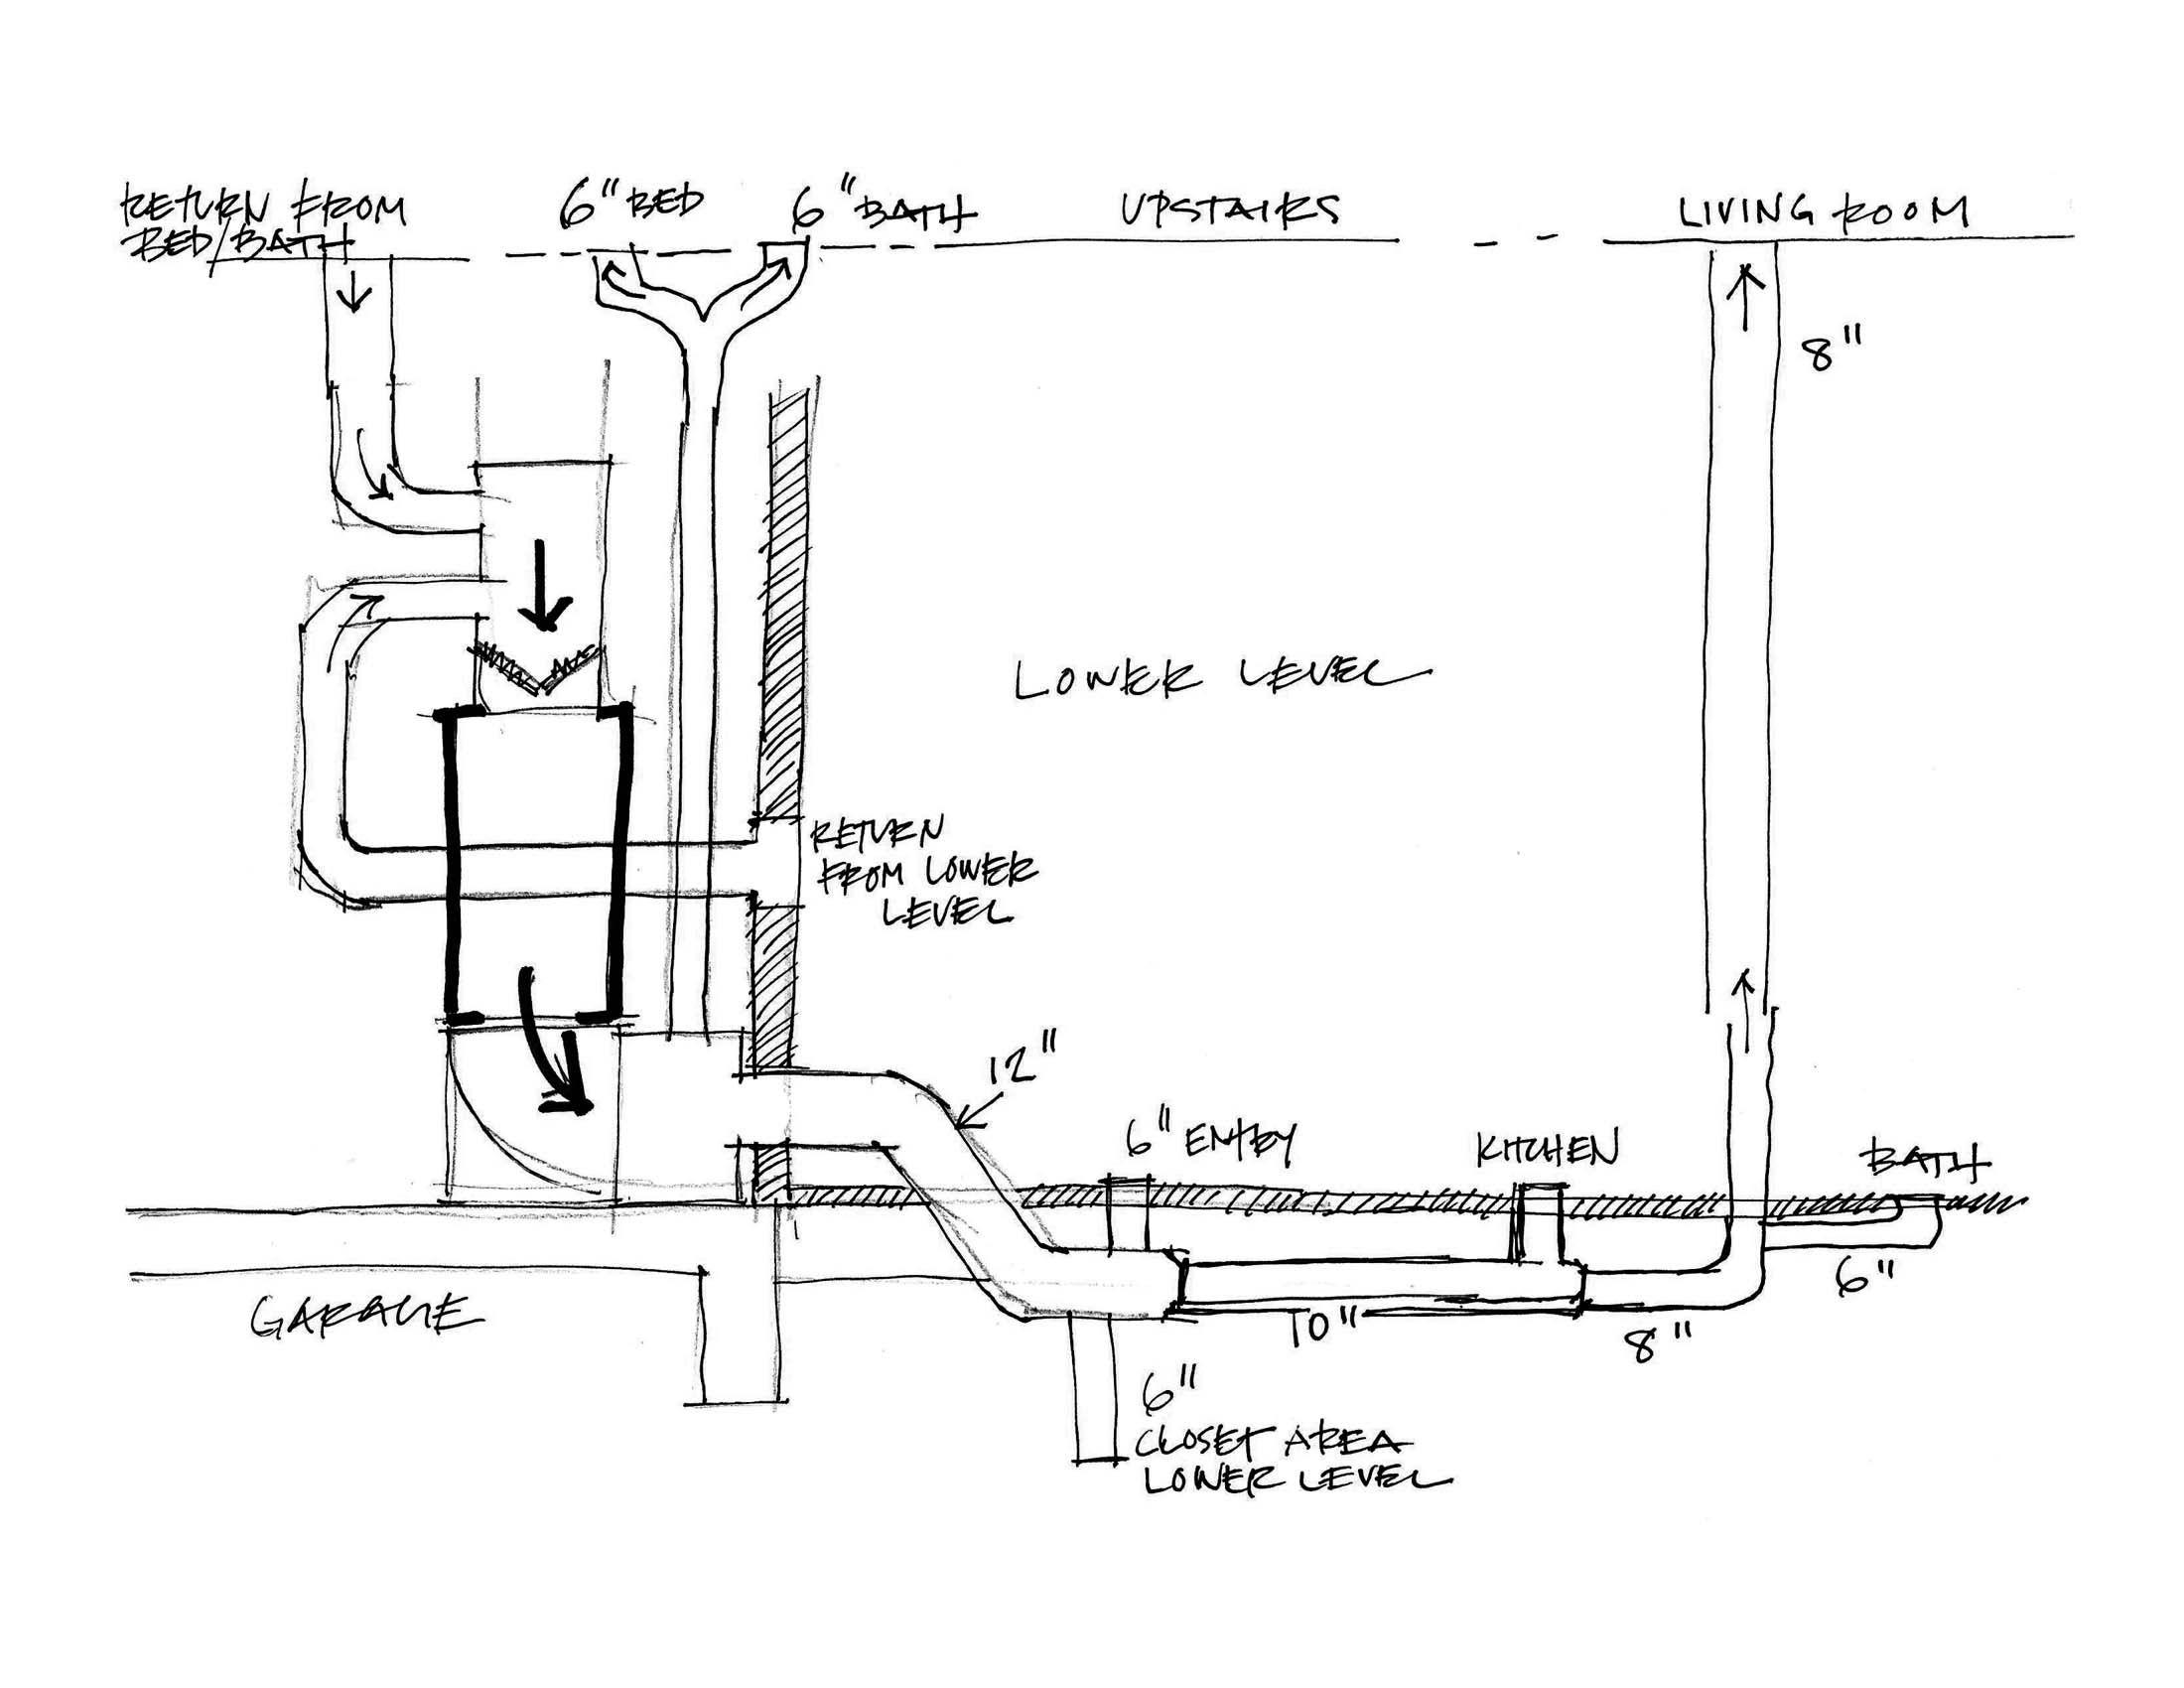 medium resolution of sketch diagram residential plumbing